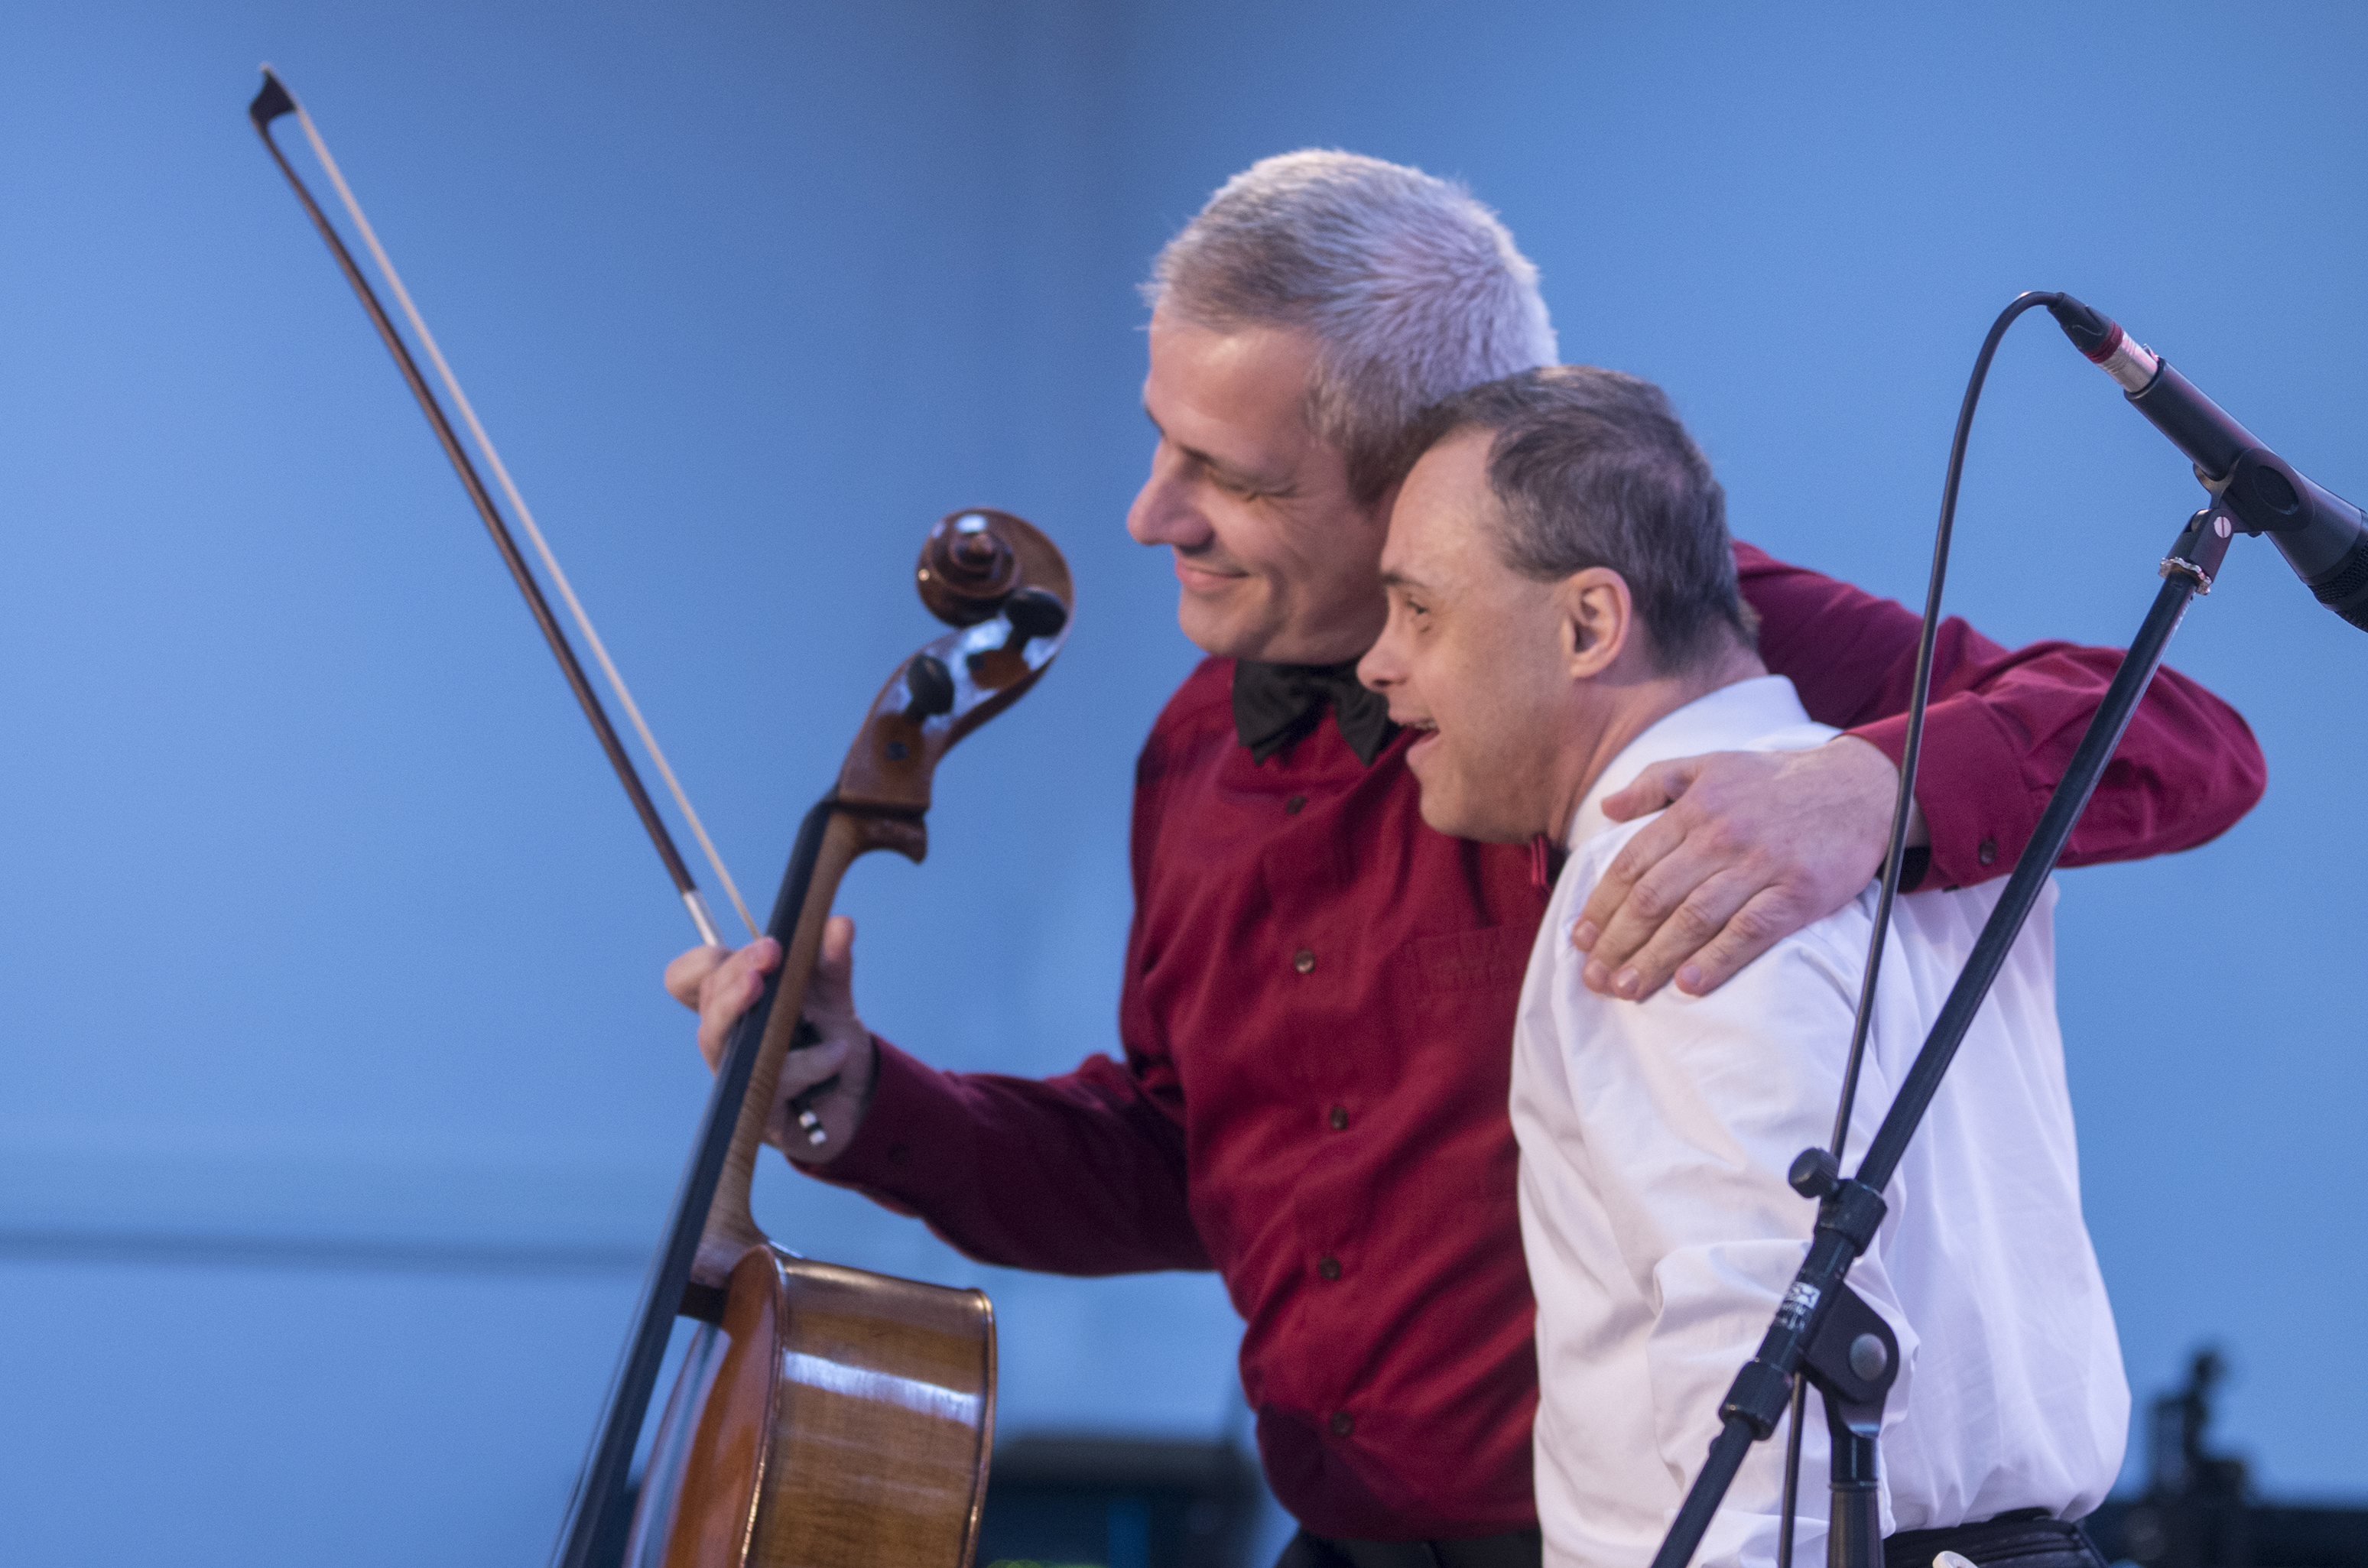 Muzica ne uneste si ne face pe toti acelasi - Managementul unor formatii muzicale compusa din tineri cu dizabilitati